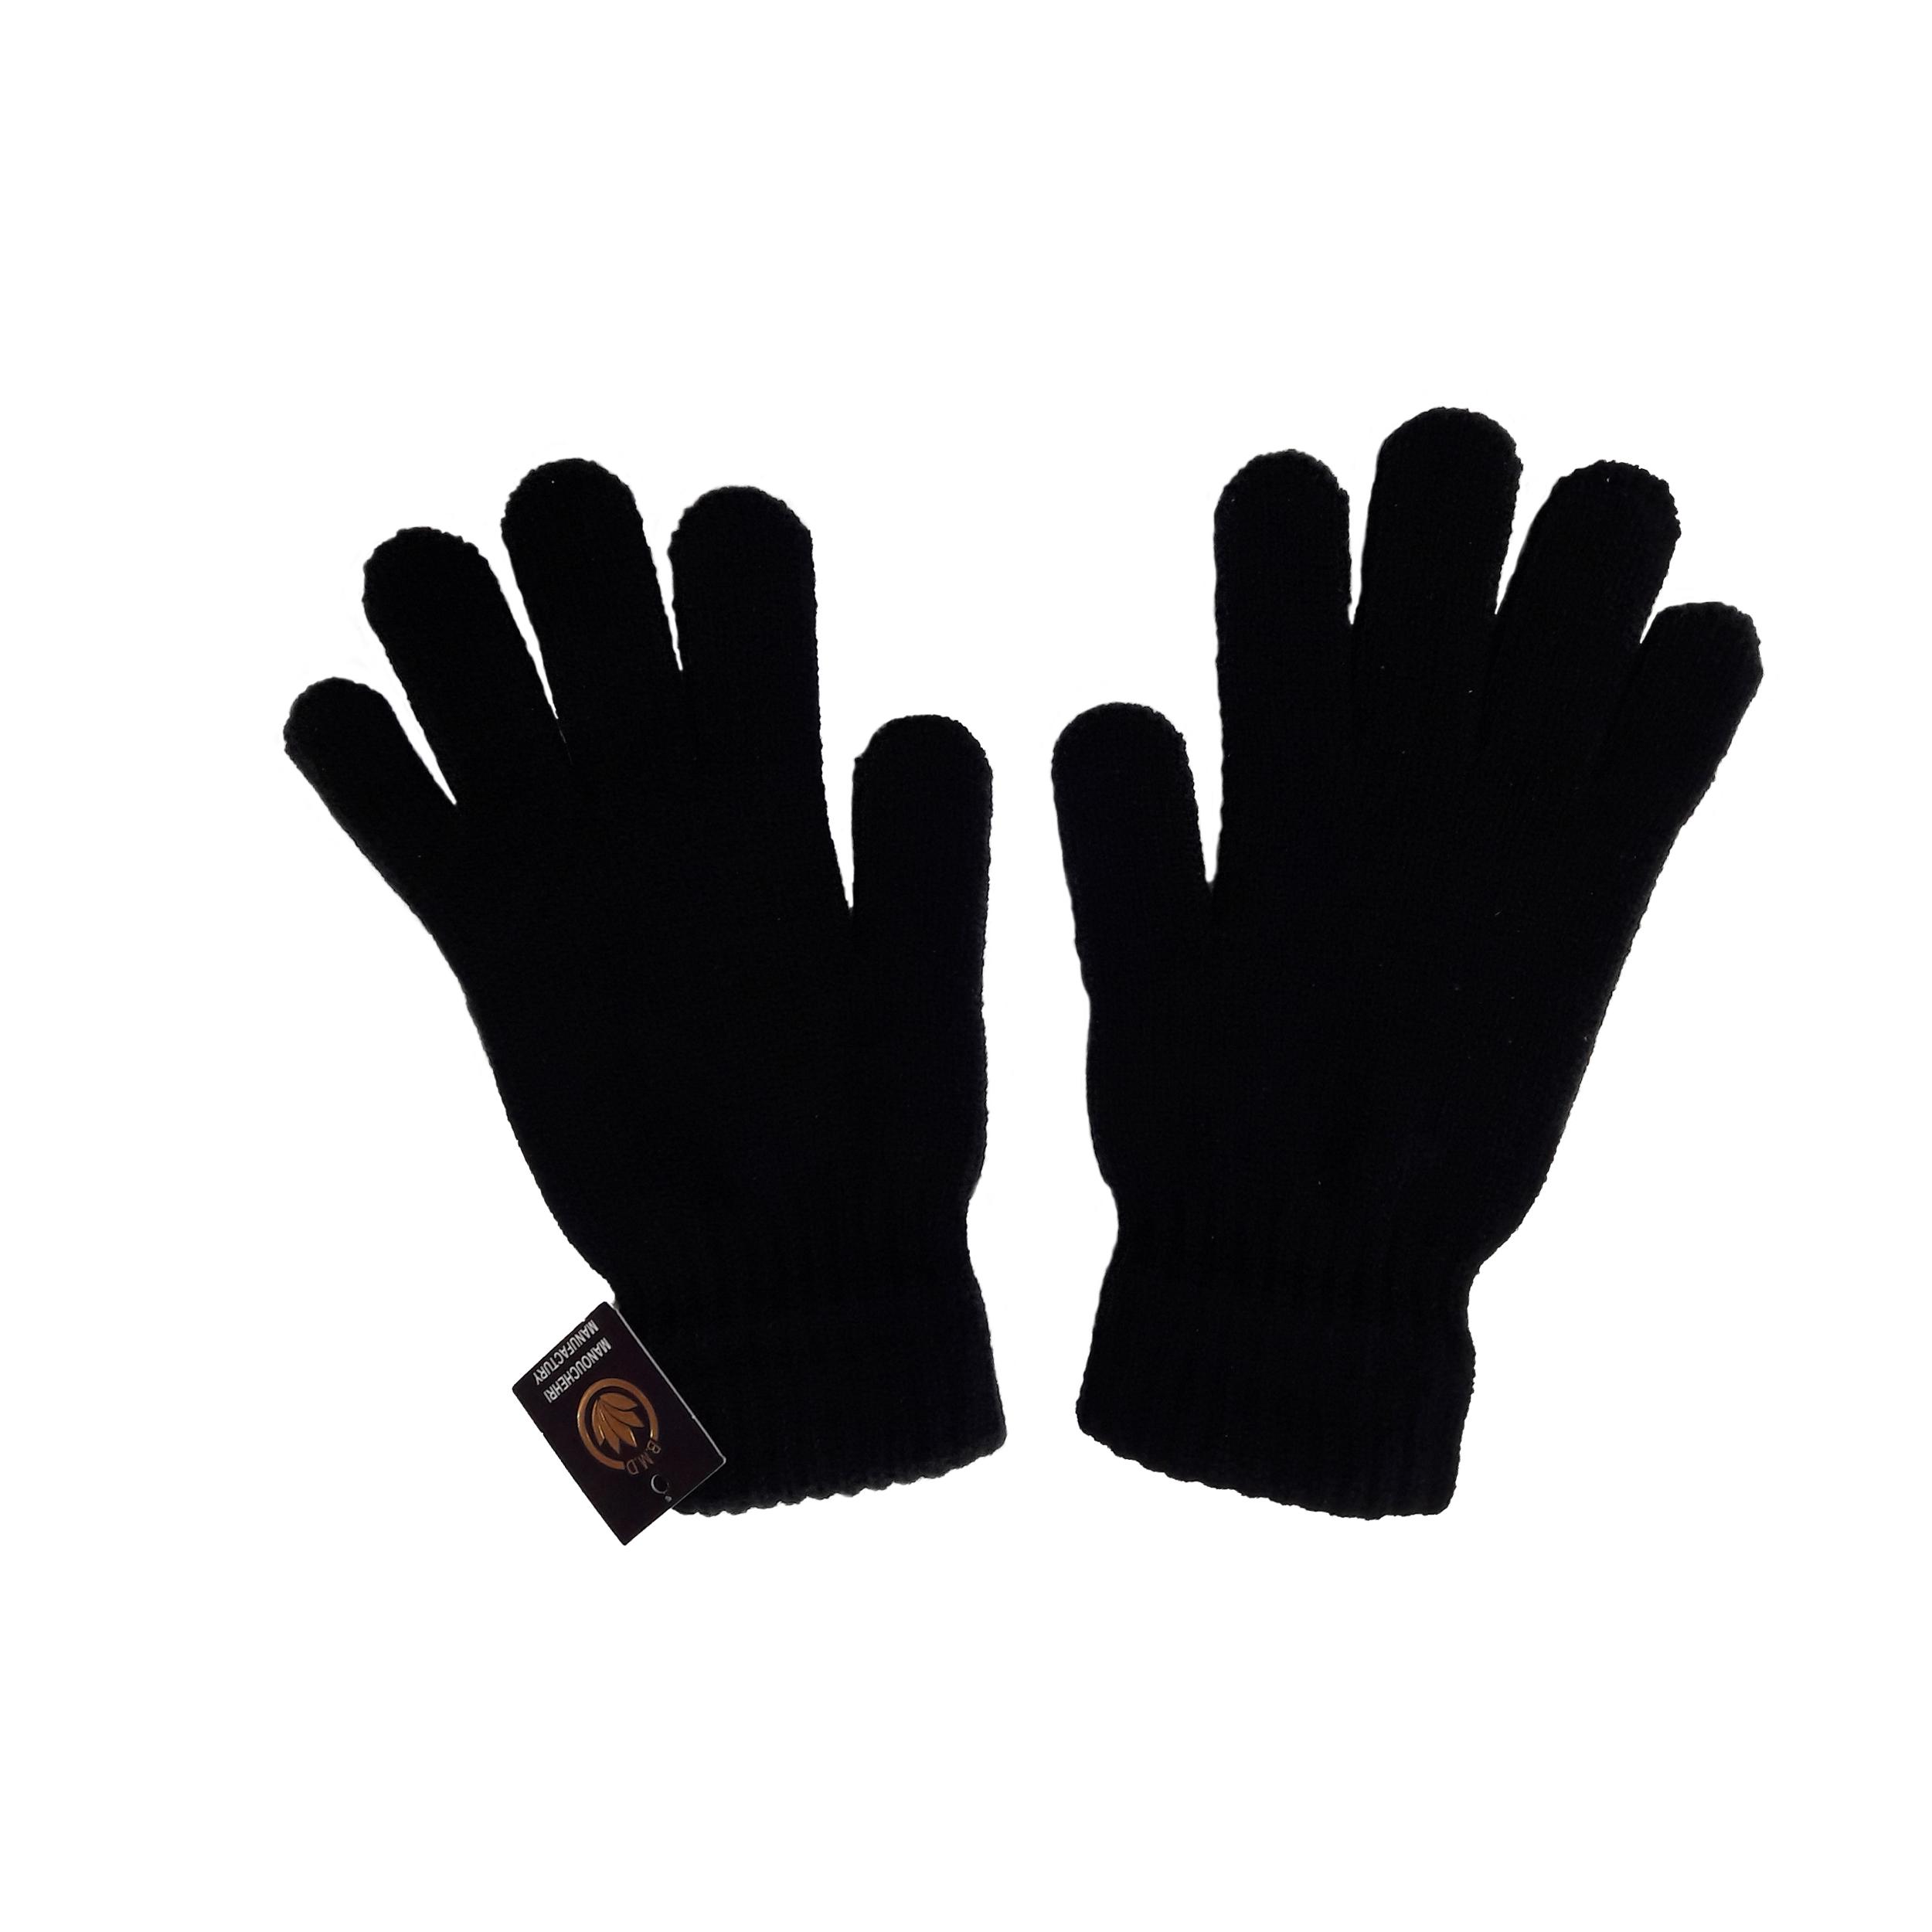 دستکش بافتنی تولیدی منوچهری کد uit56 main 1 3